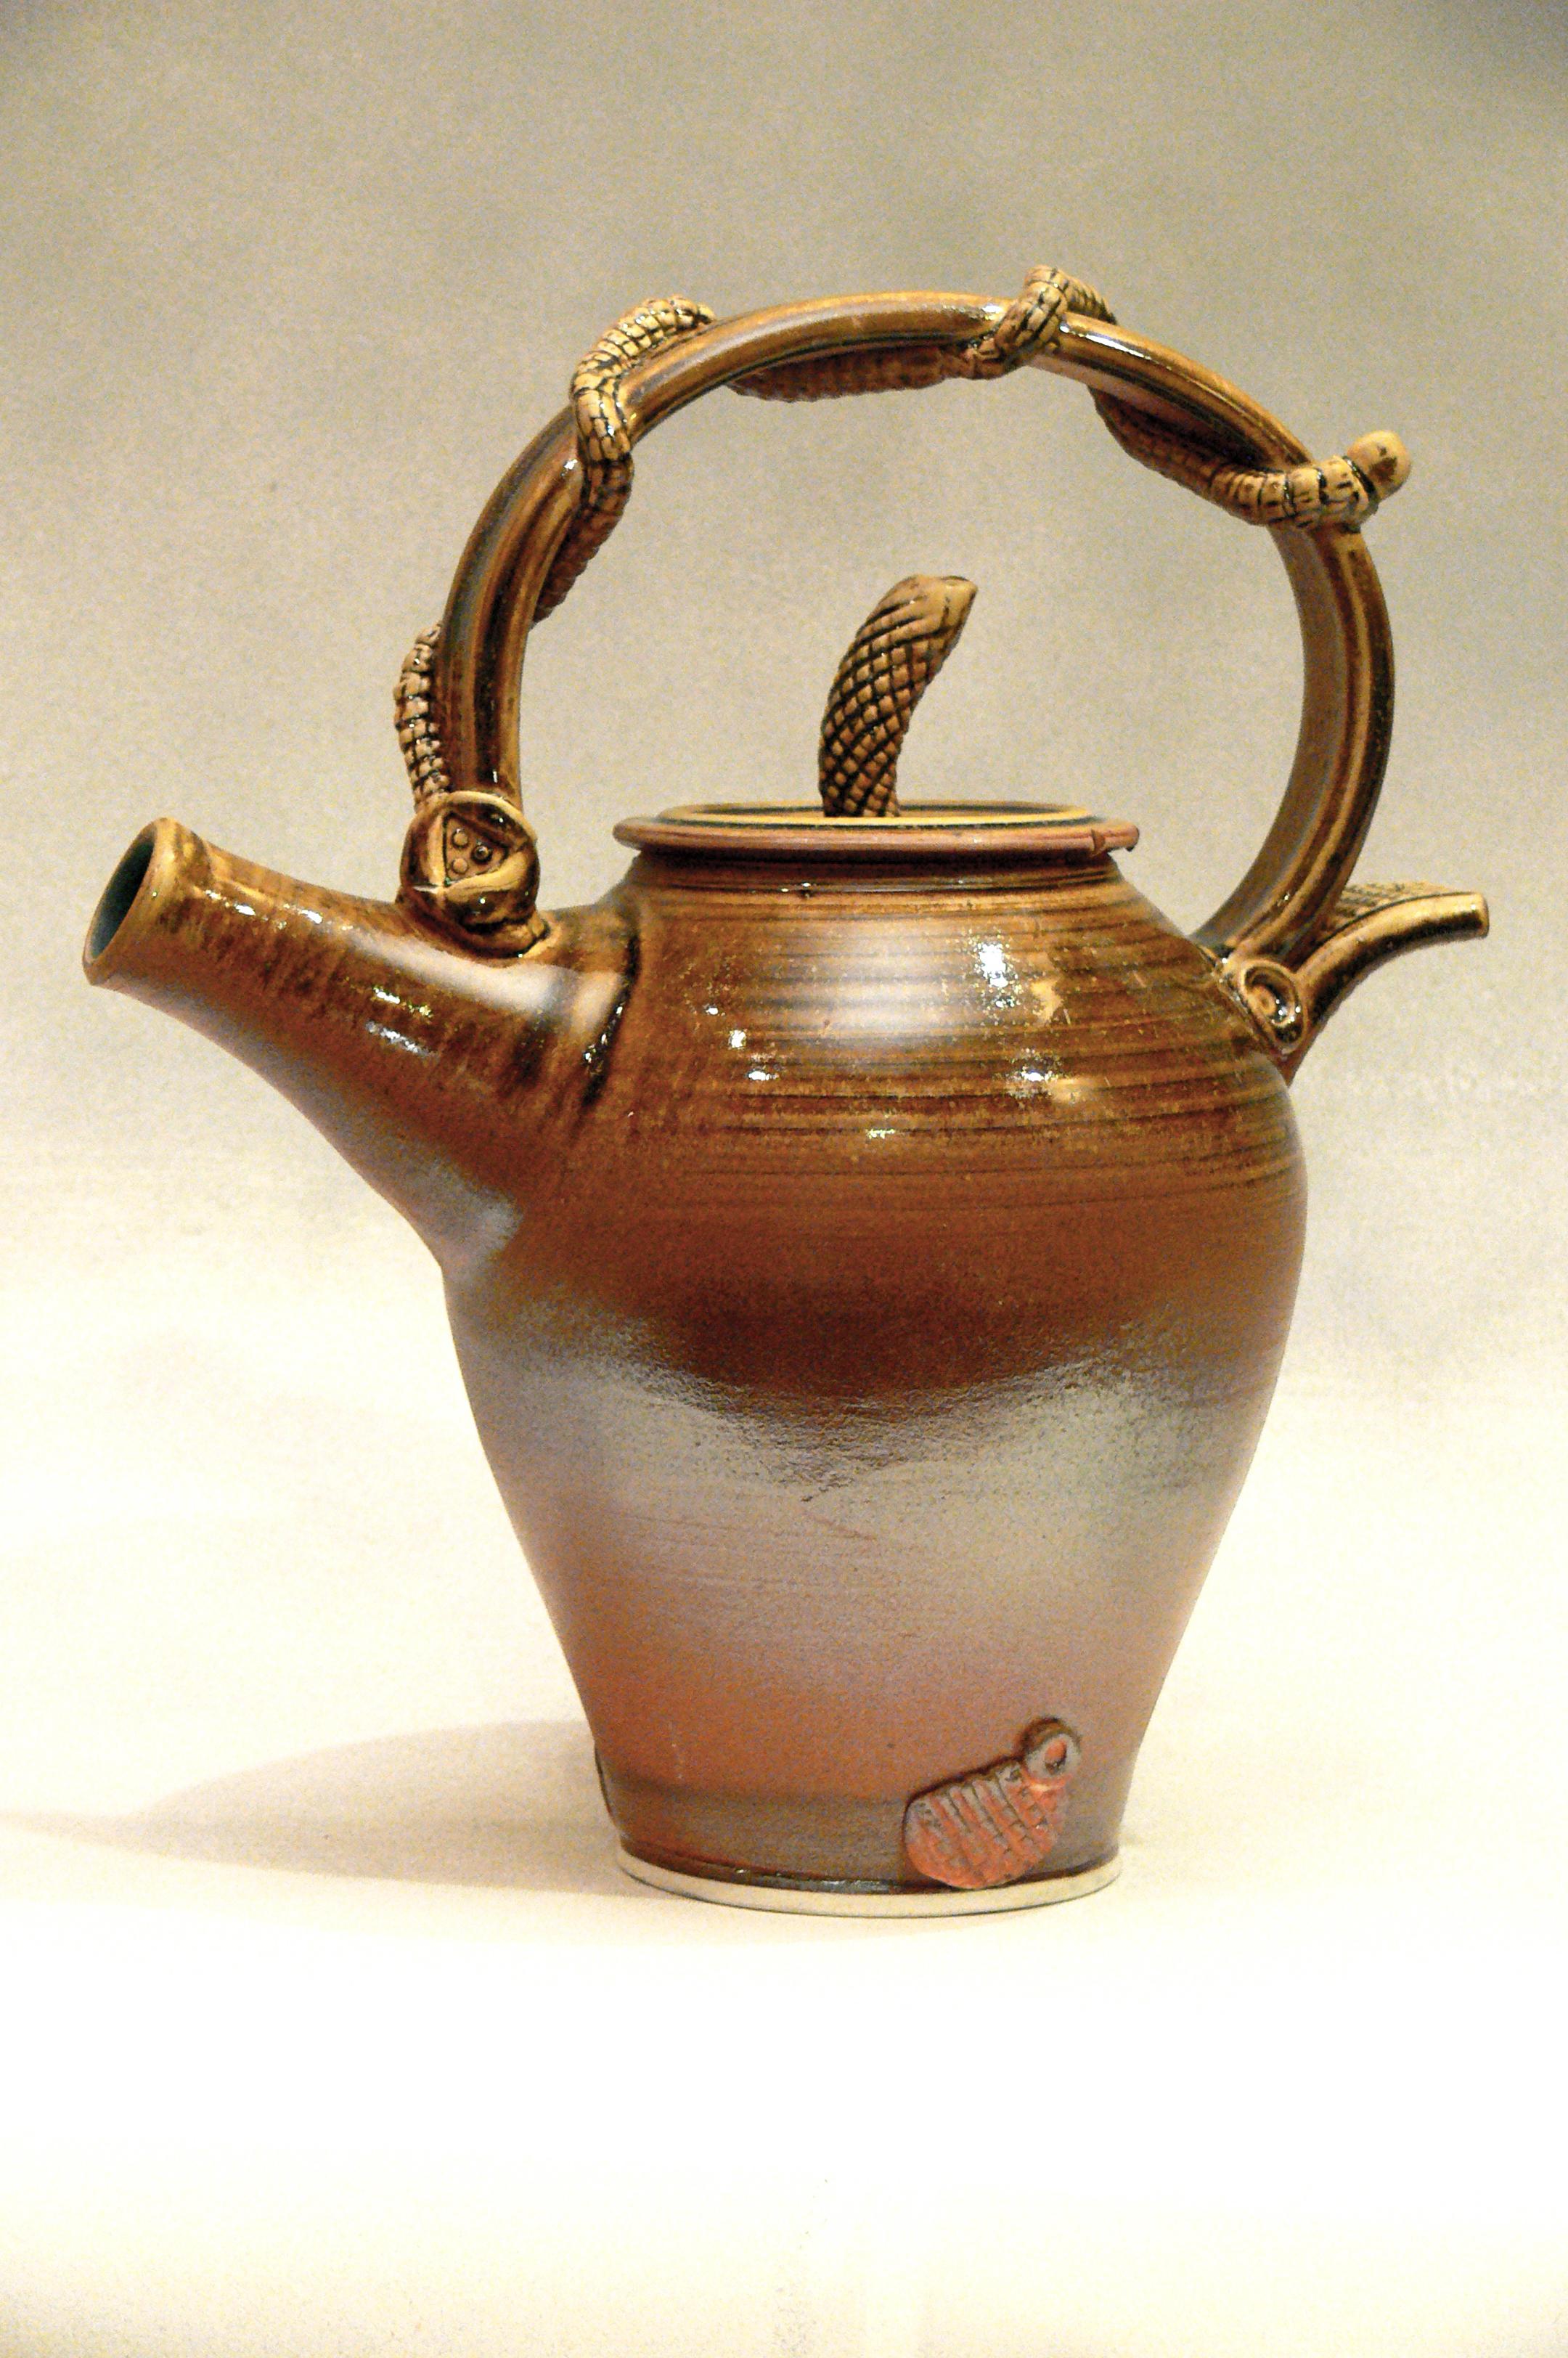 Ash and Shino Teapot